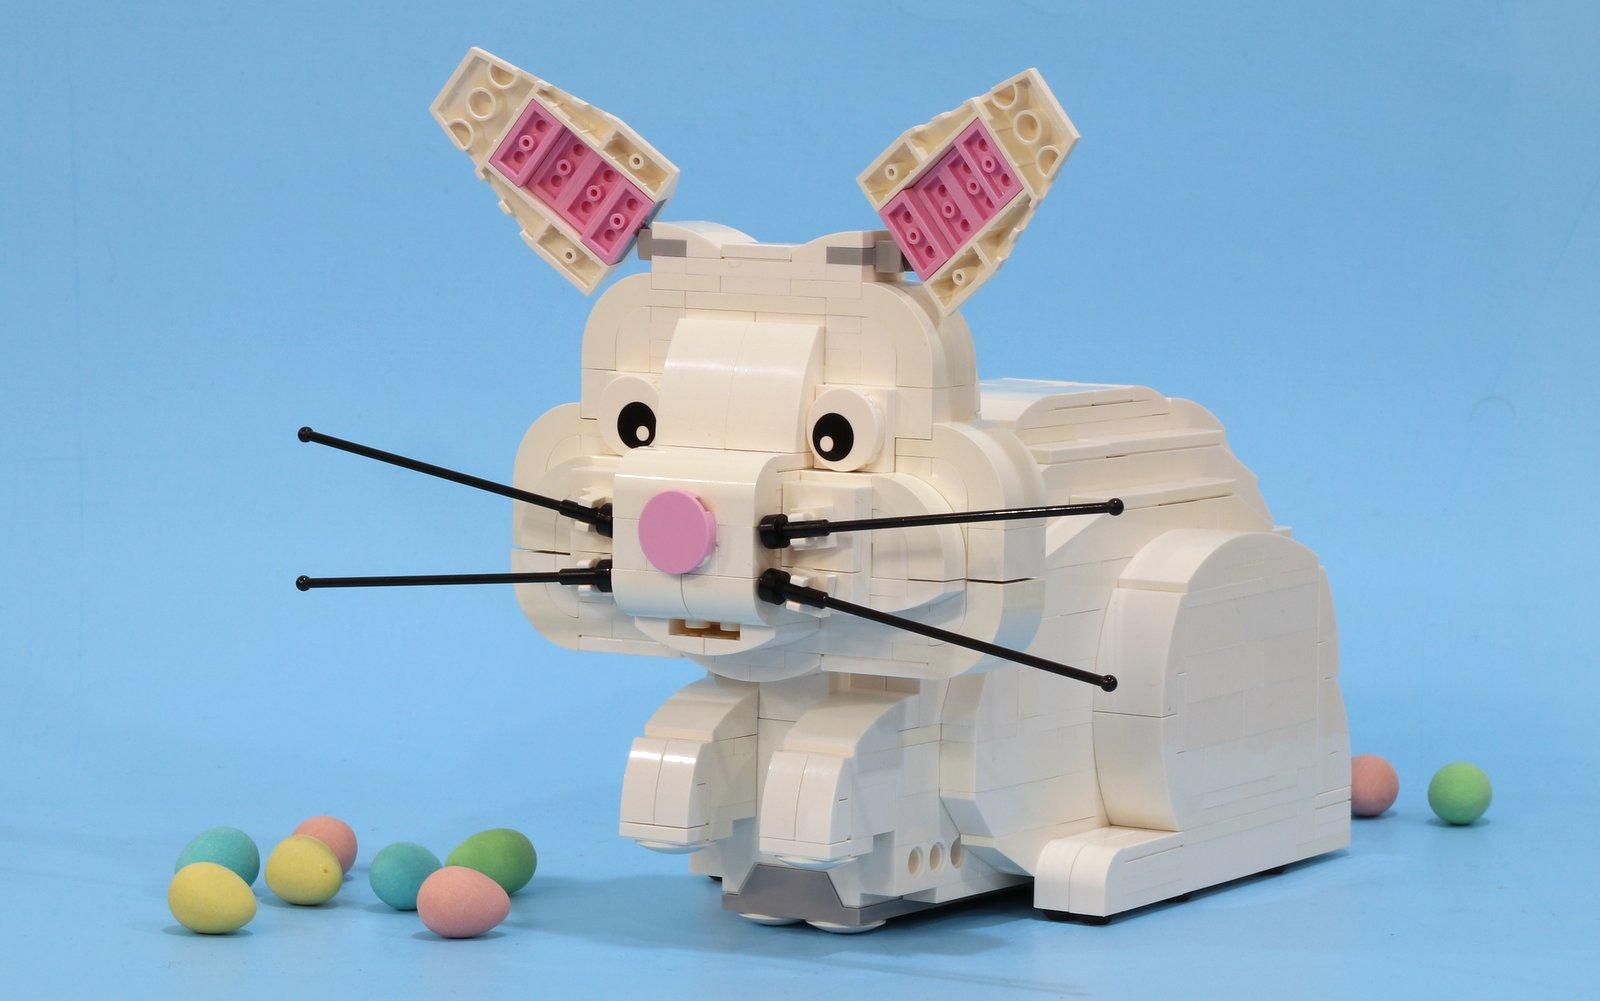 lego friends rabbit instructions